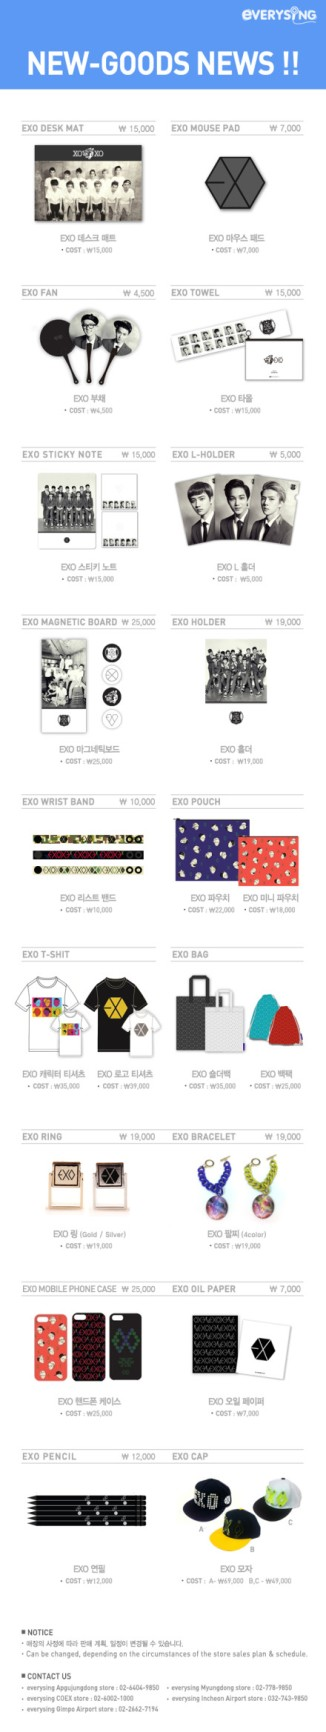 everysing merchandise update